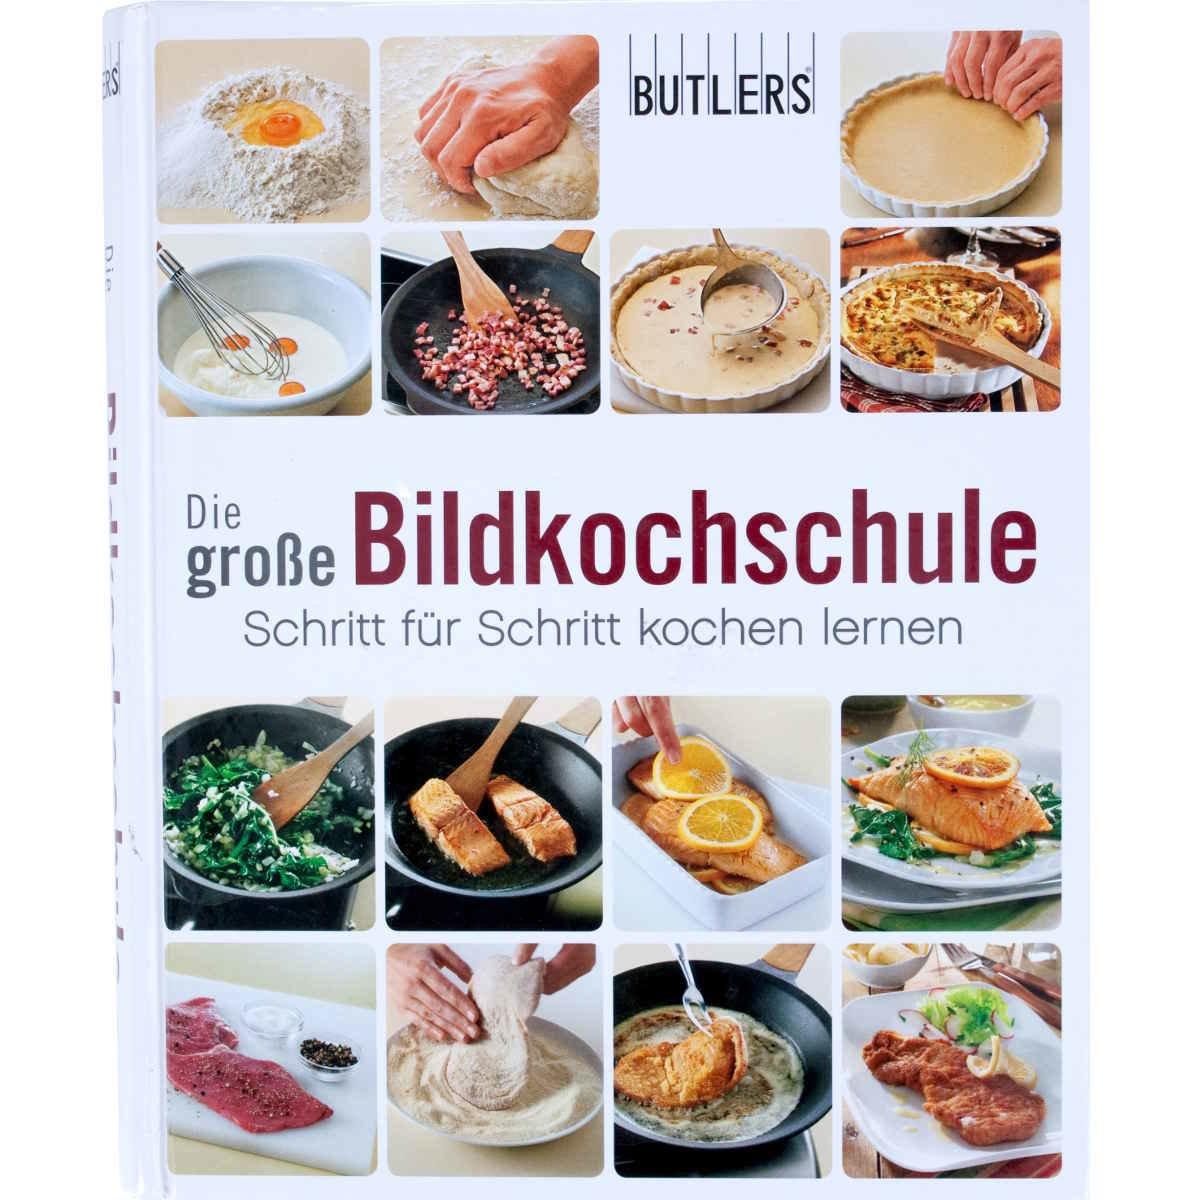 Butlers Die große Bildkochschule Gebundenes Buch B00ZE1UVJK